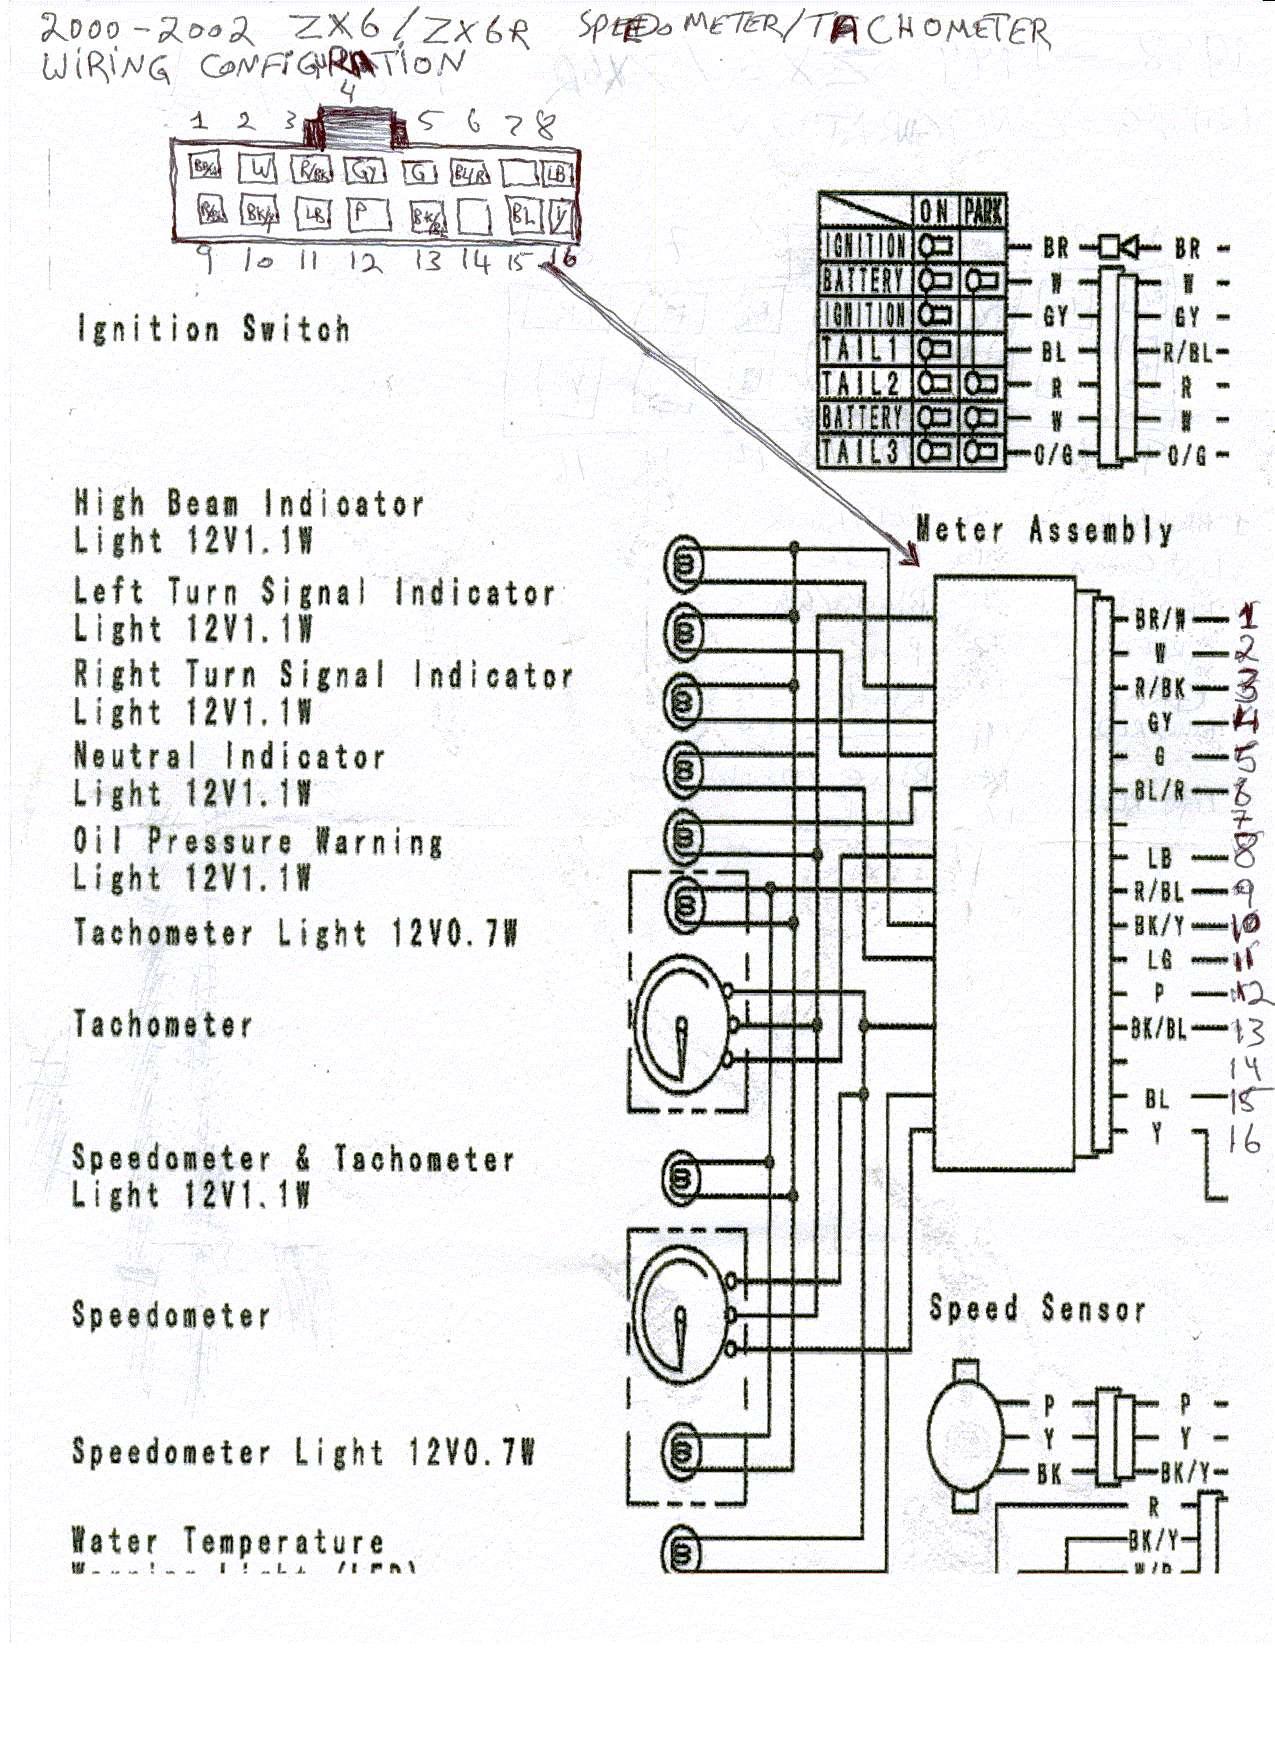 Zx6R Wire Diagram : Fuel Pump Wiring Help For 05 Kawasaki